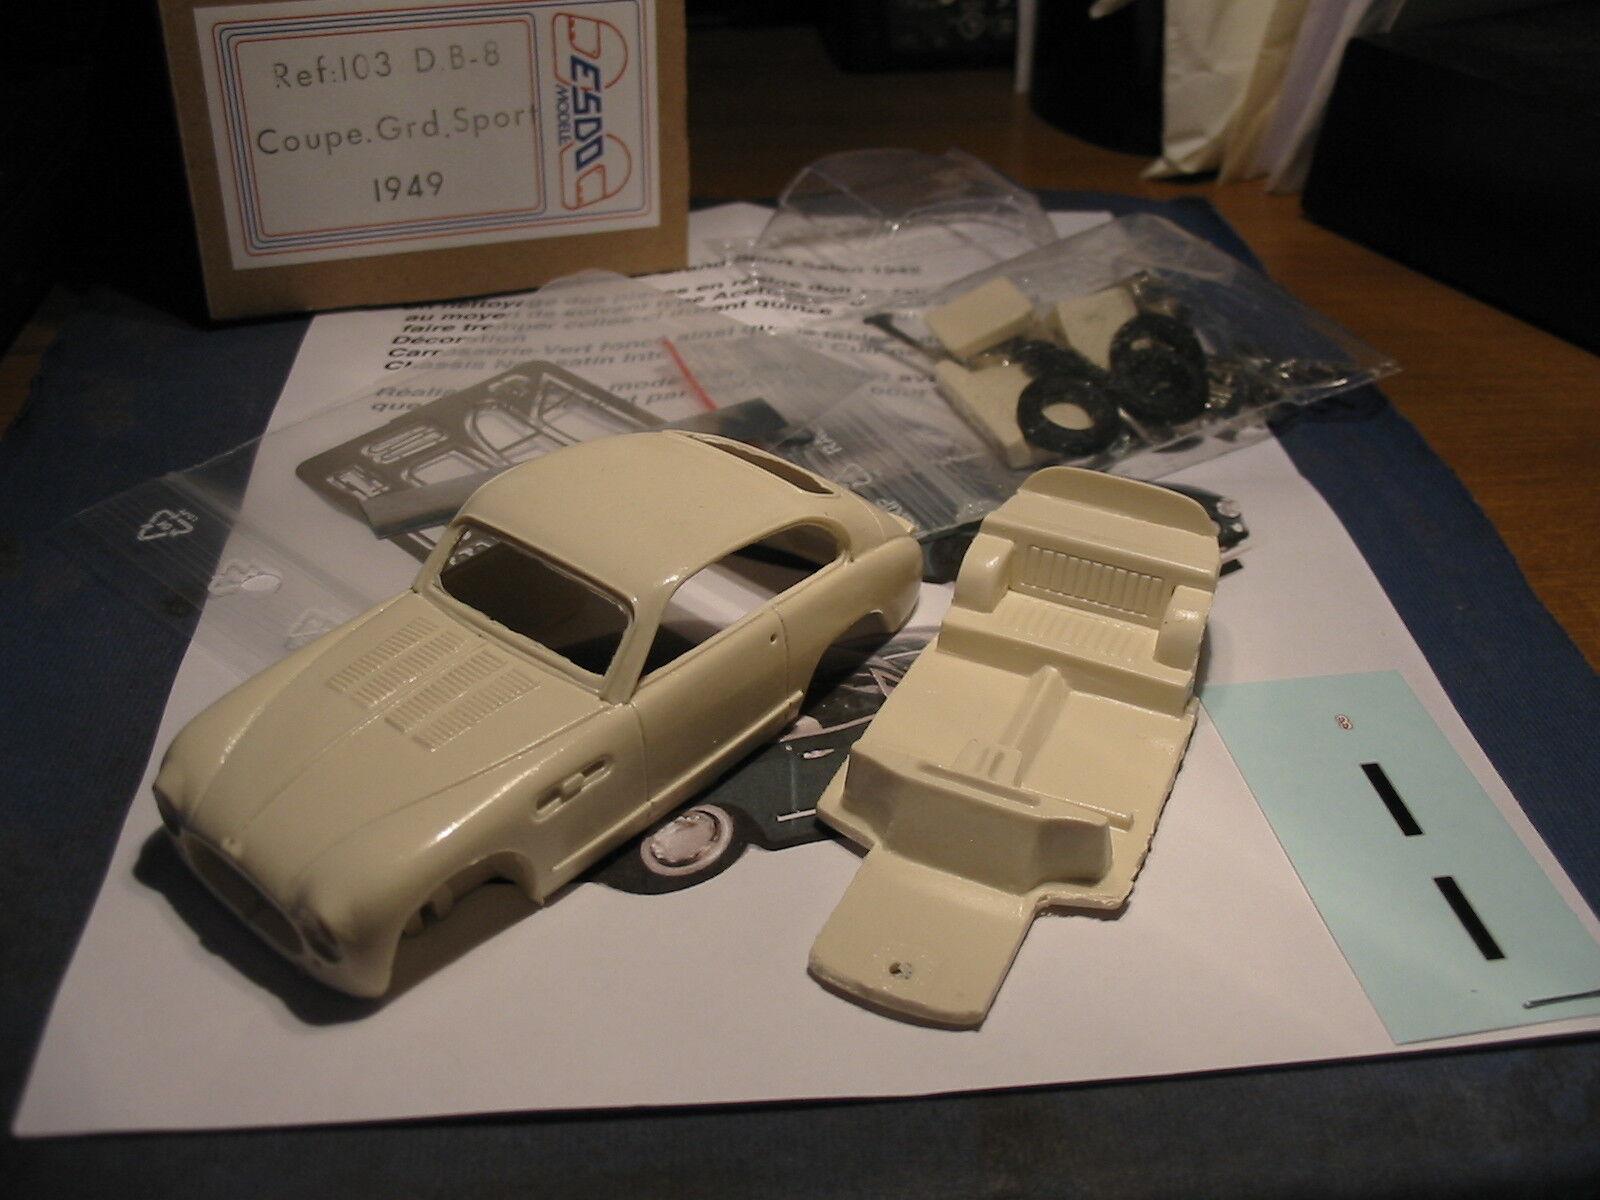 kit DB8 Grand Sport Coupé 1949  - Esdo Models kit 1 43  no.1 en ligne